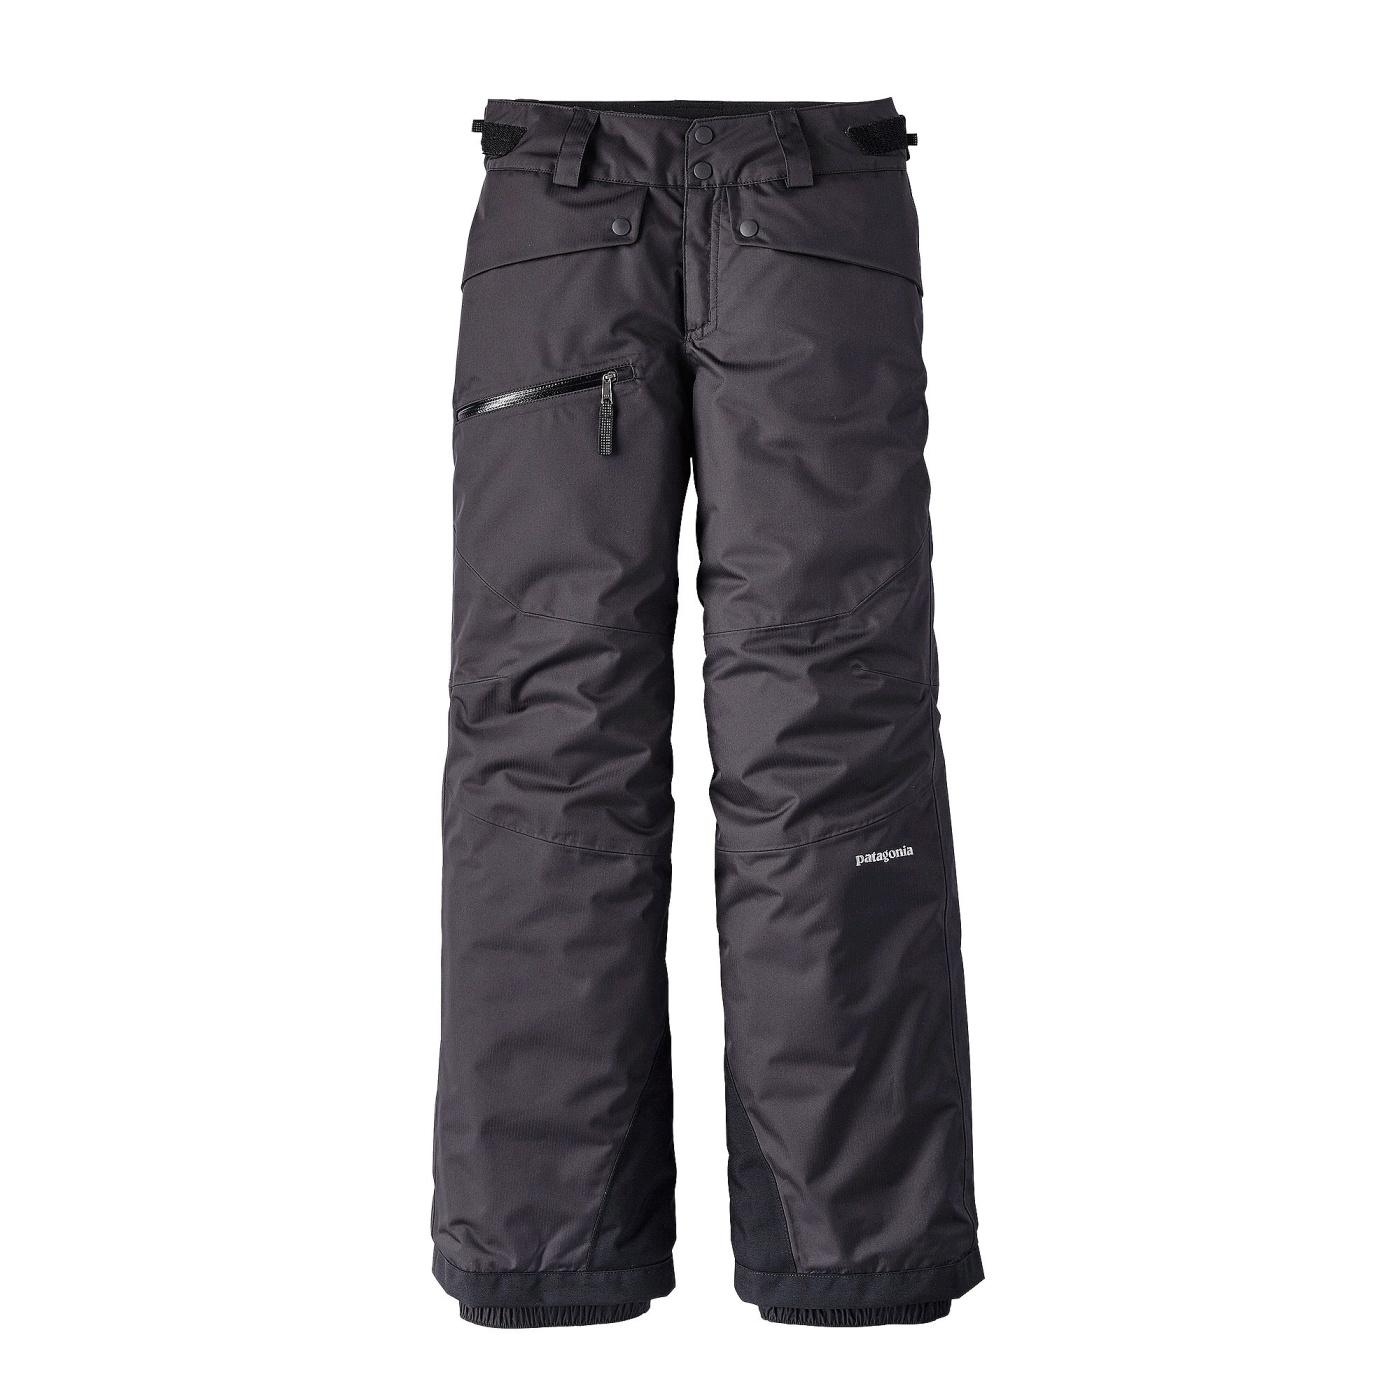 Patagonia Girls' Snowbelle Pants Black-30